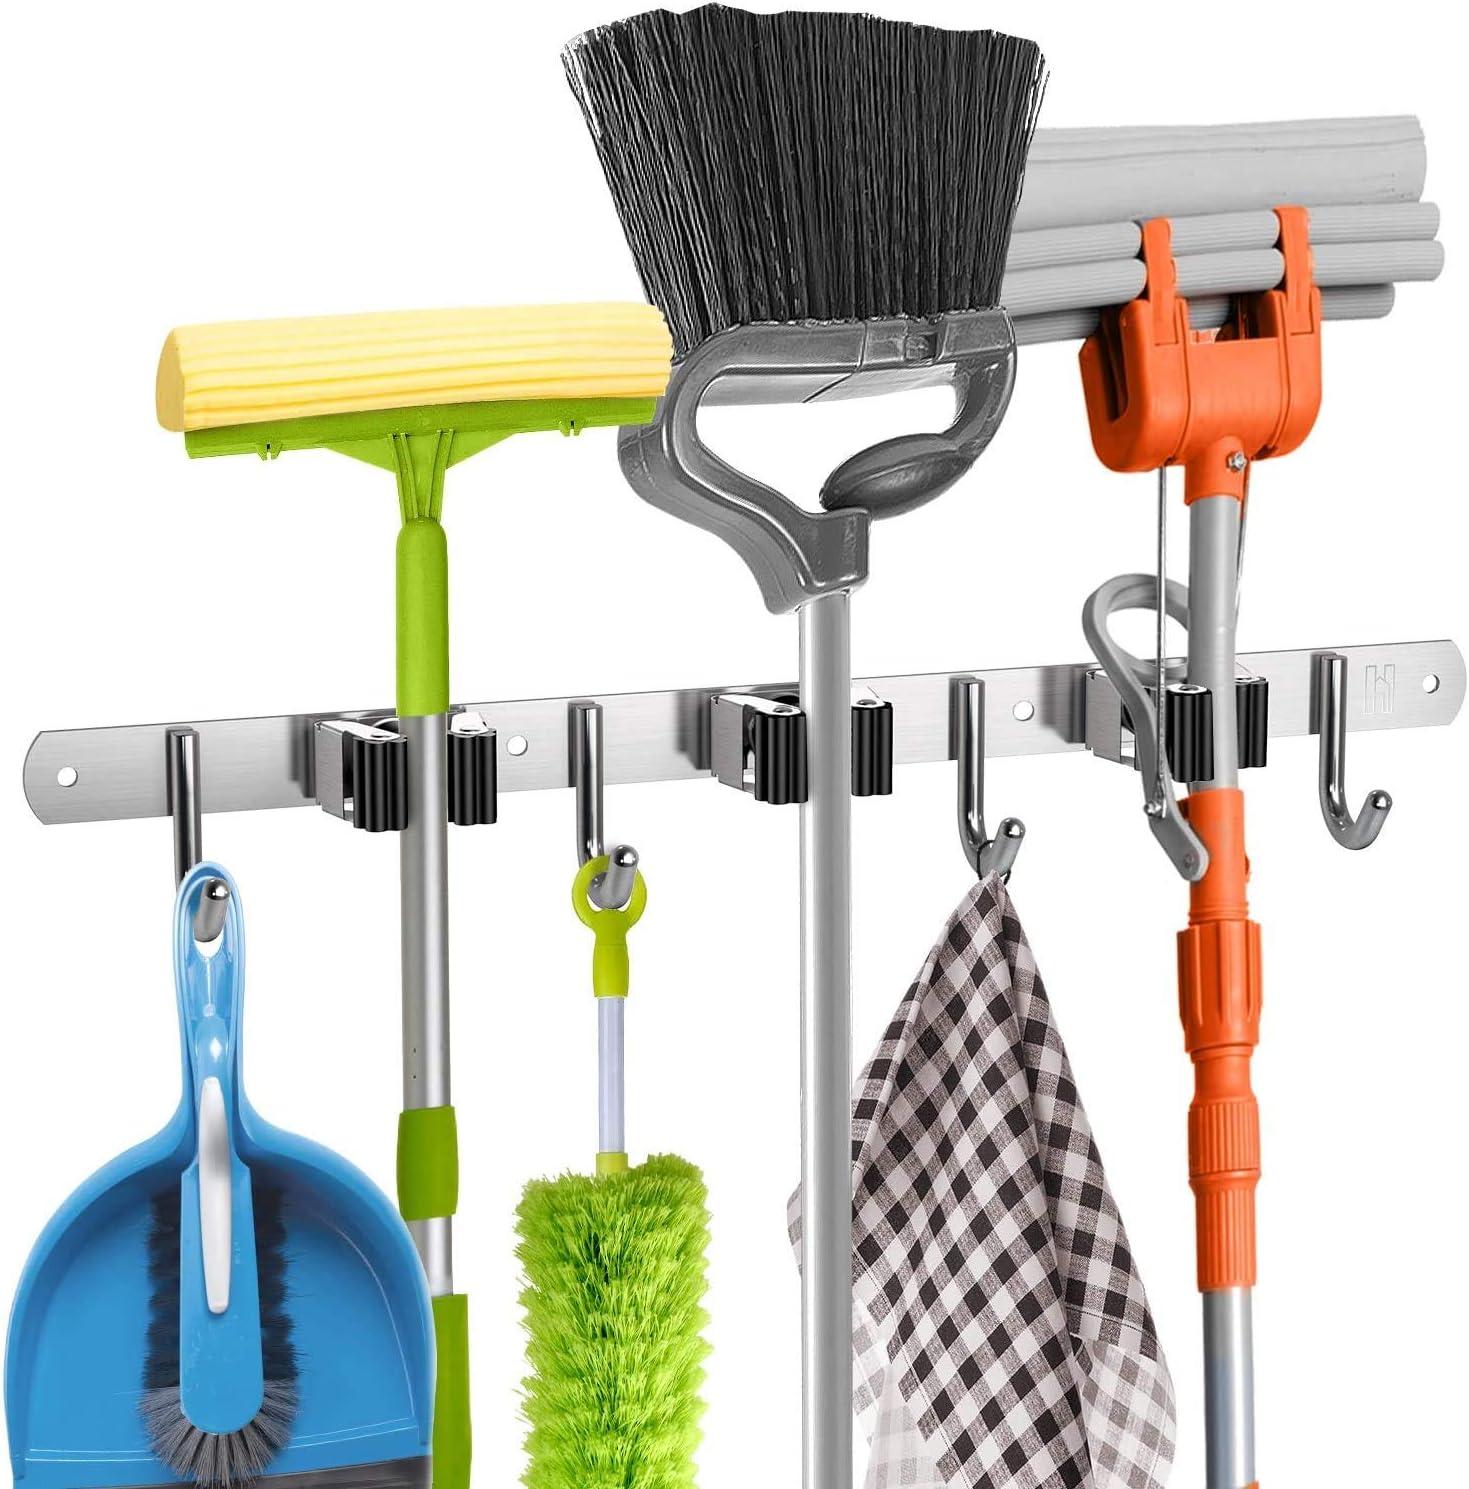 Garage Storage Utility Hooks,Wall Mount Tool Holder Mop broom Organizers